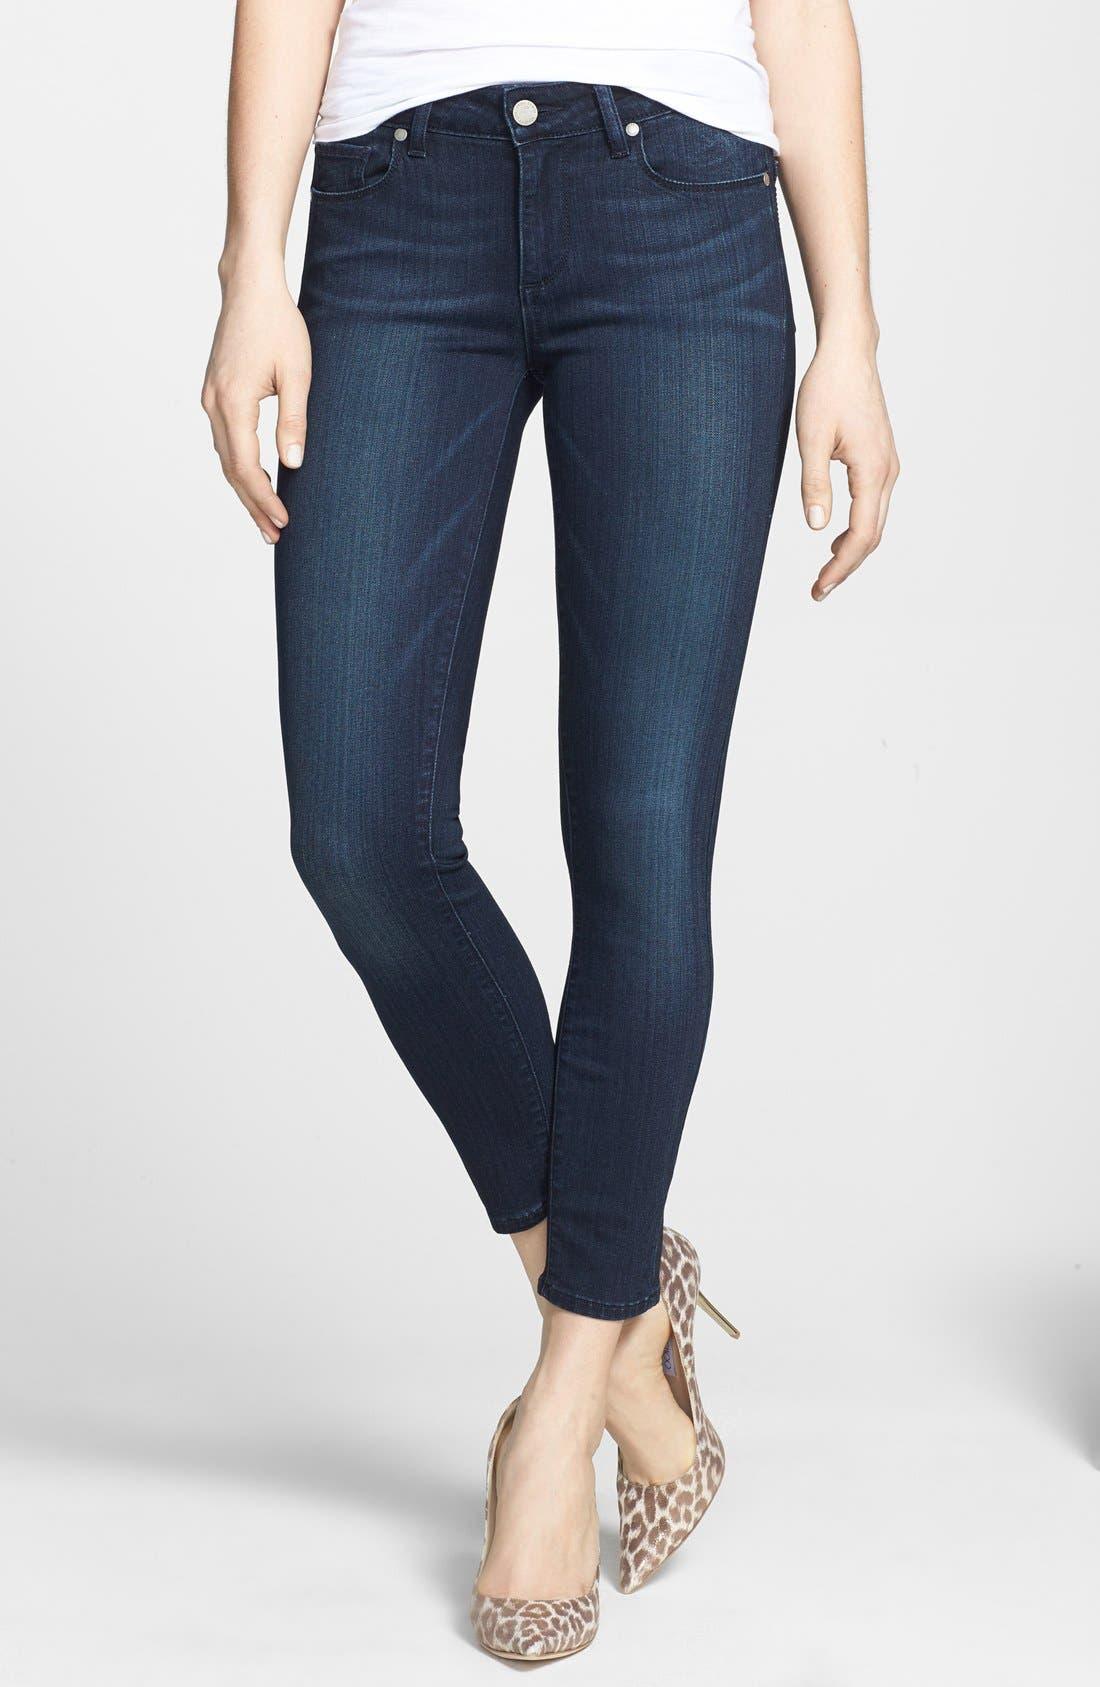 Transcend - Verdugo Crop Skinny Jeans,                         Main,                         color, Midlake